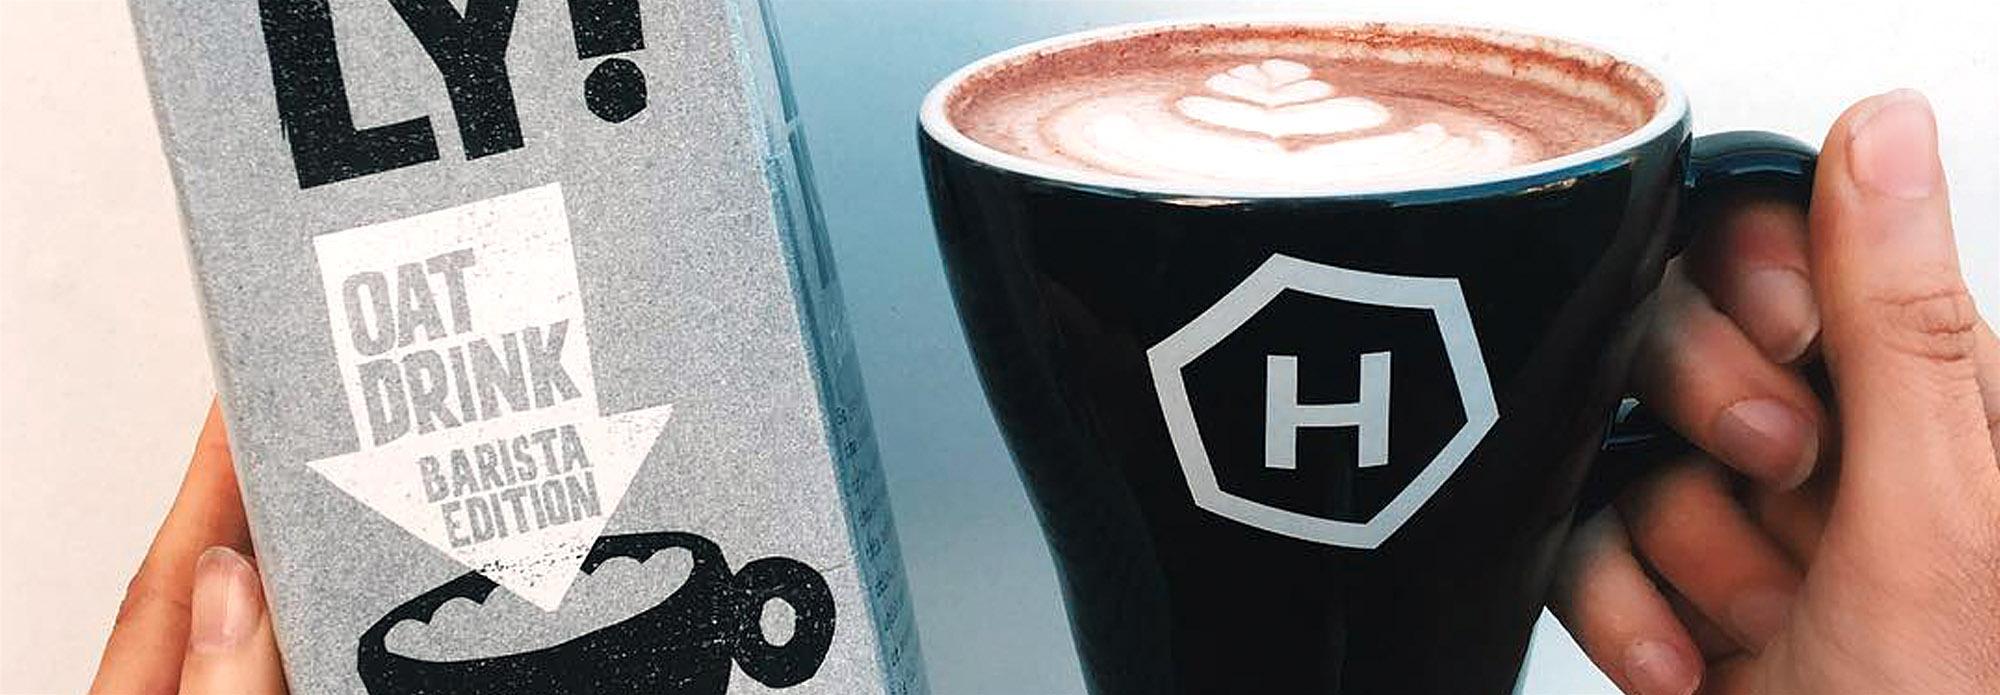 Coffee-Shop-slide-show-3.jpg